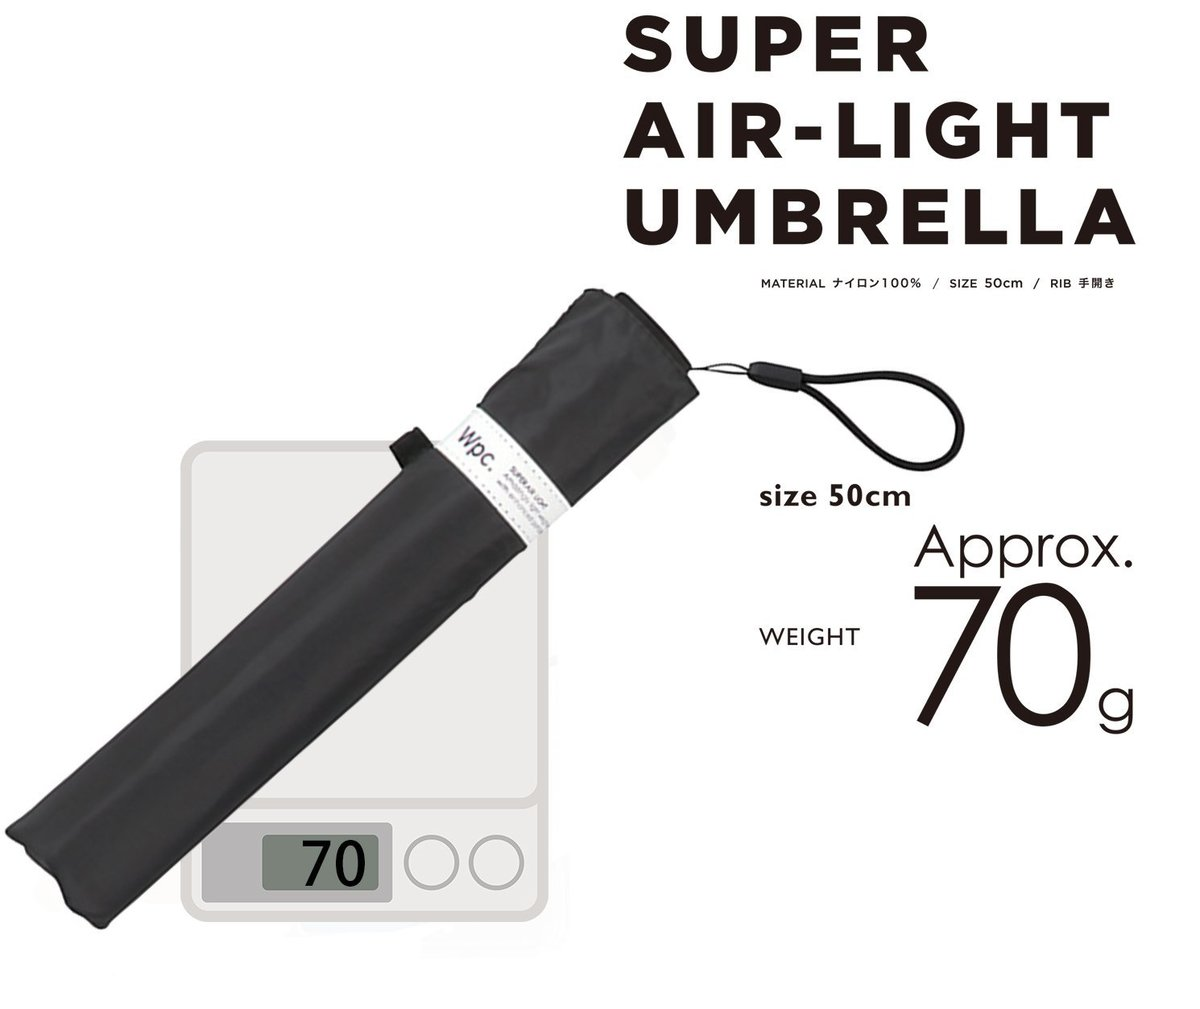 (Black 70g) KiU Super Air-Light (70g) light weight folding umbrella with UV protection